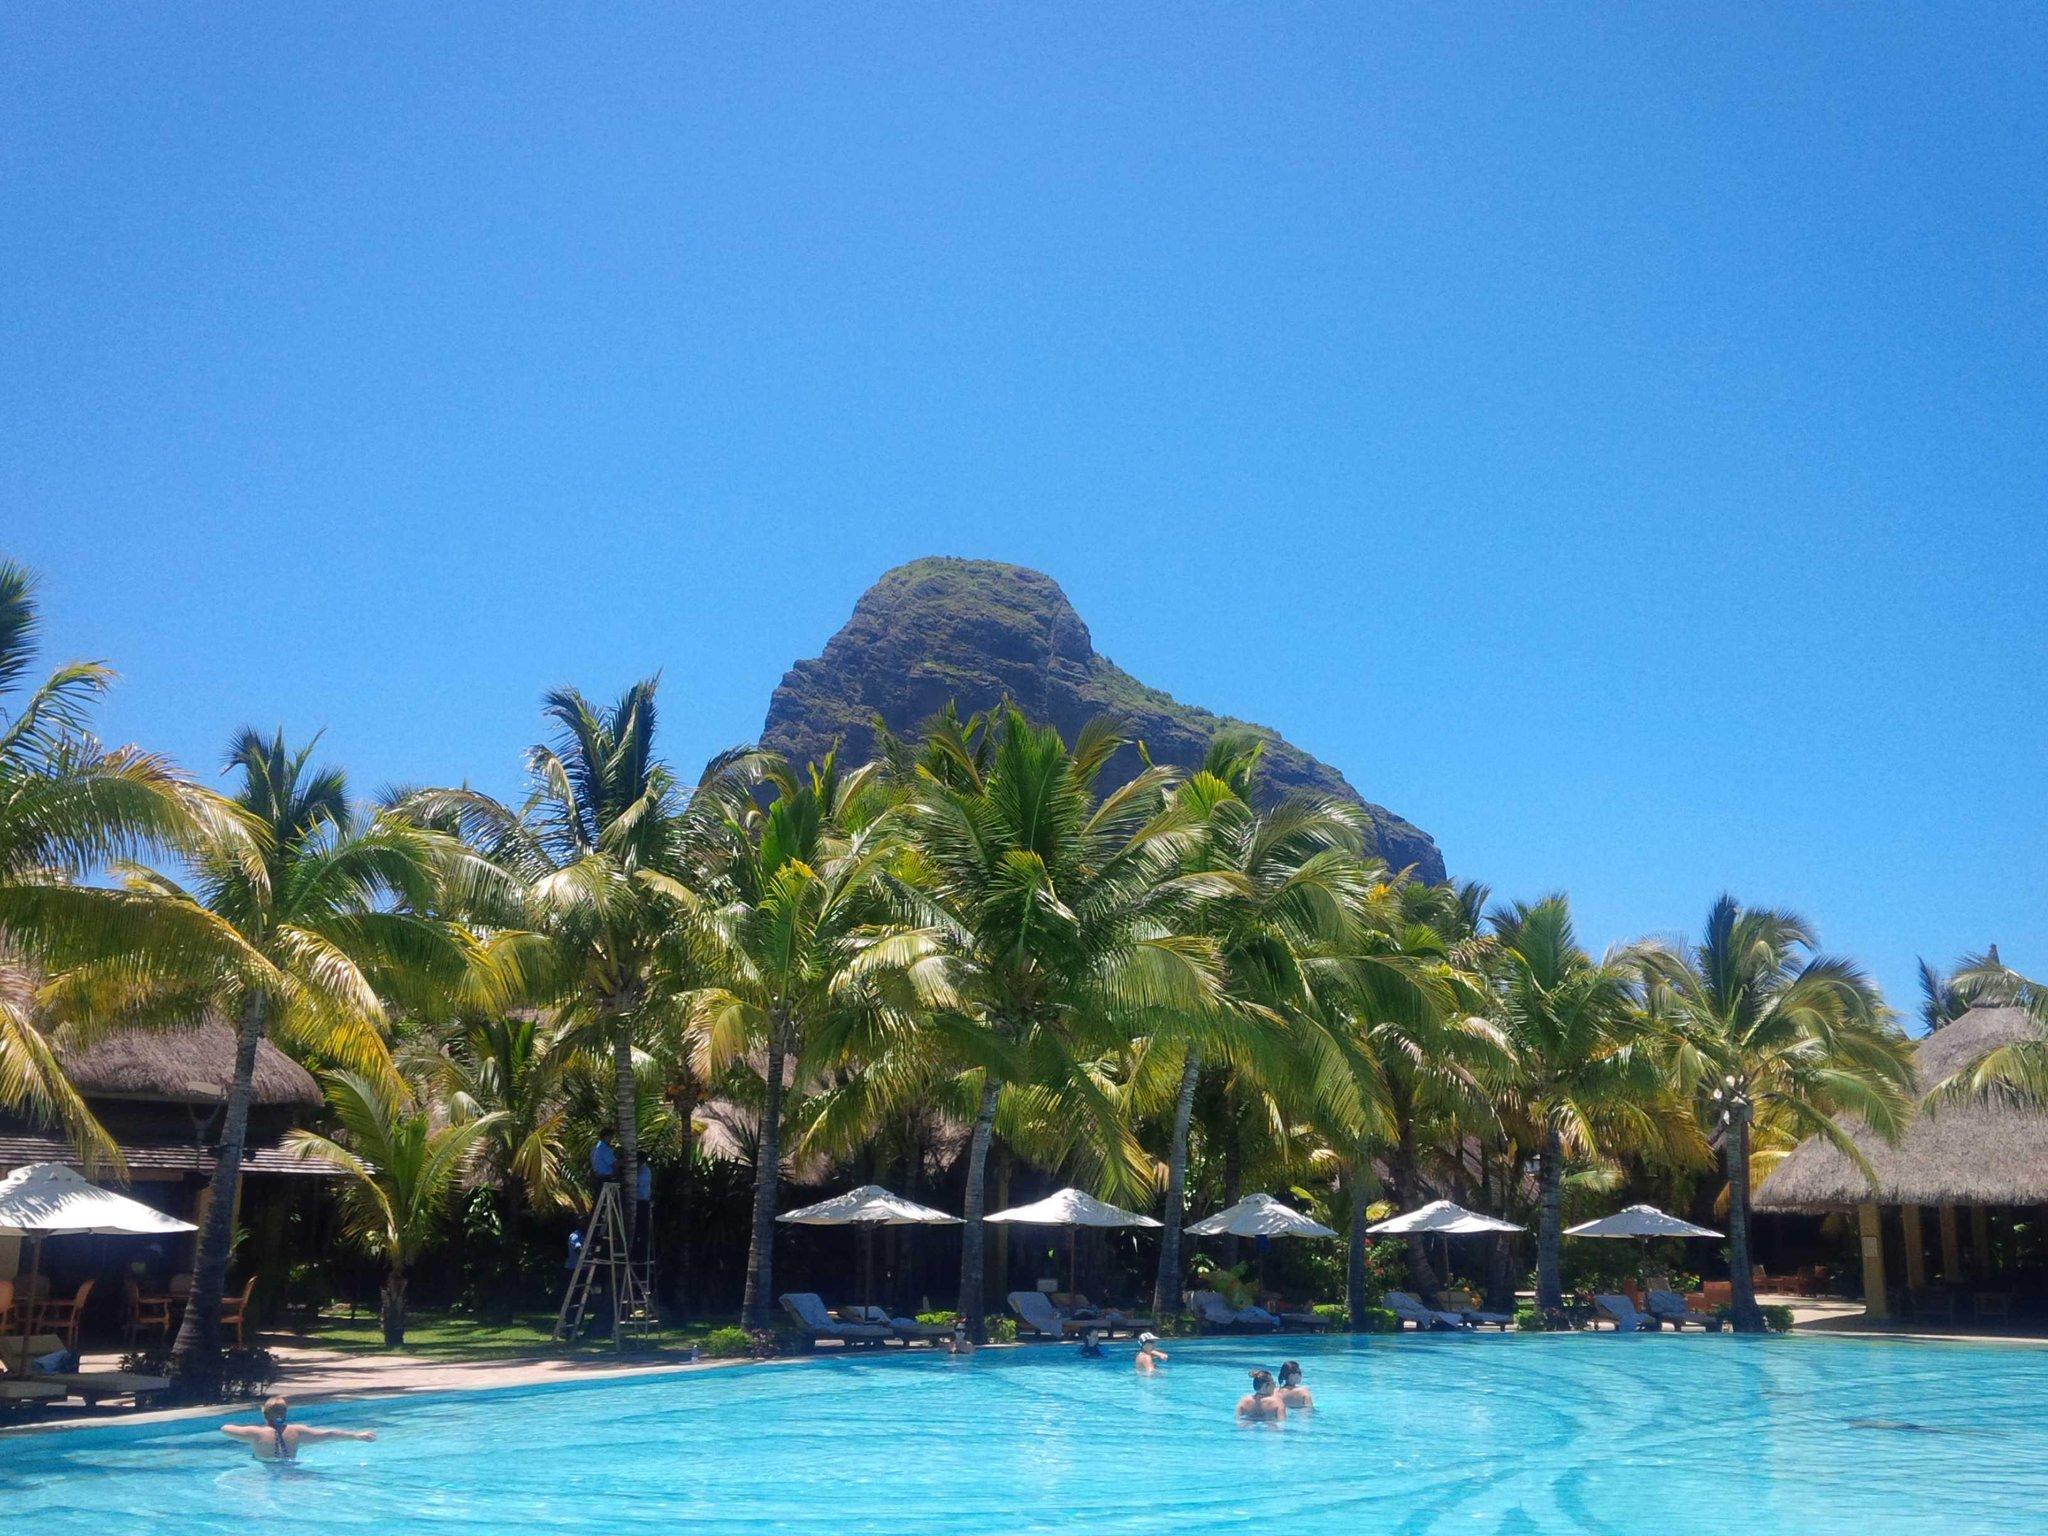 #hotelparadis #mauritius # beachcomber. http://t.co/D9rPhQjP0C